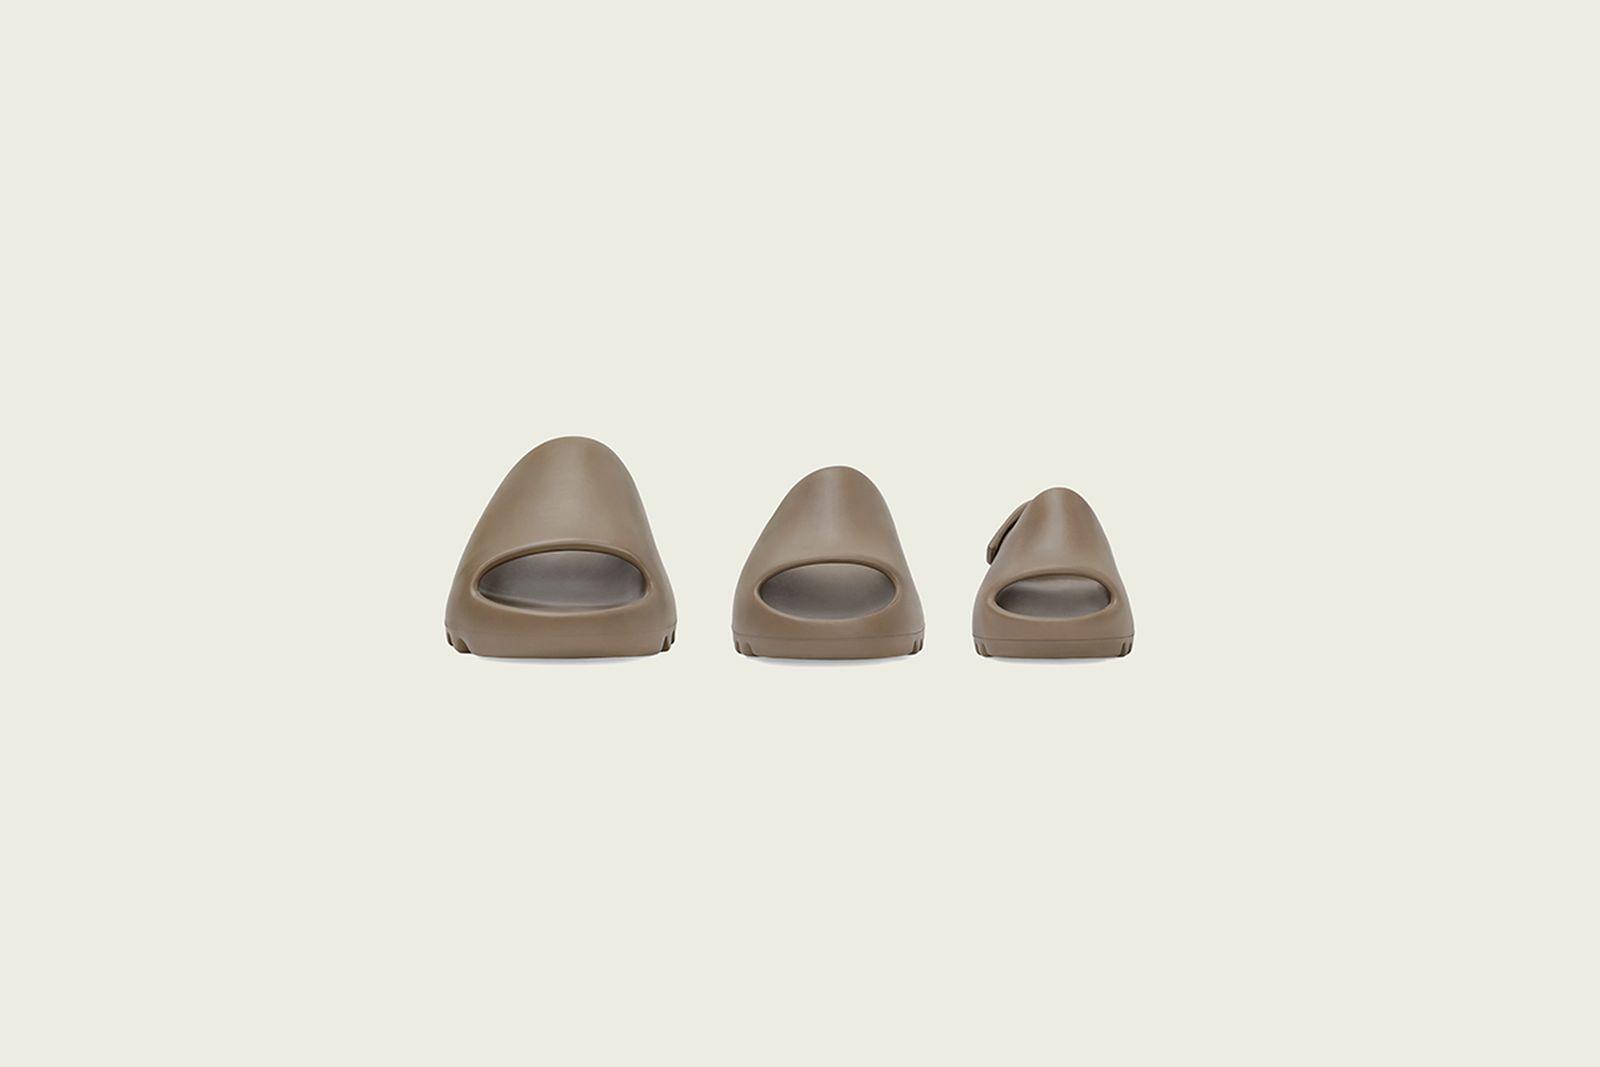 adidas-yeezy-slide-release-date-price-08